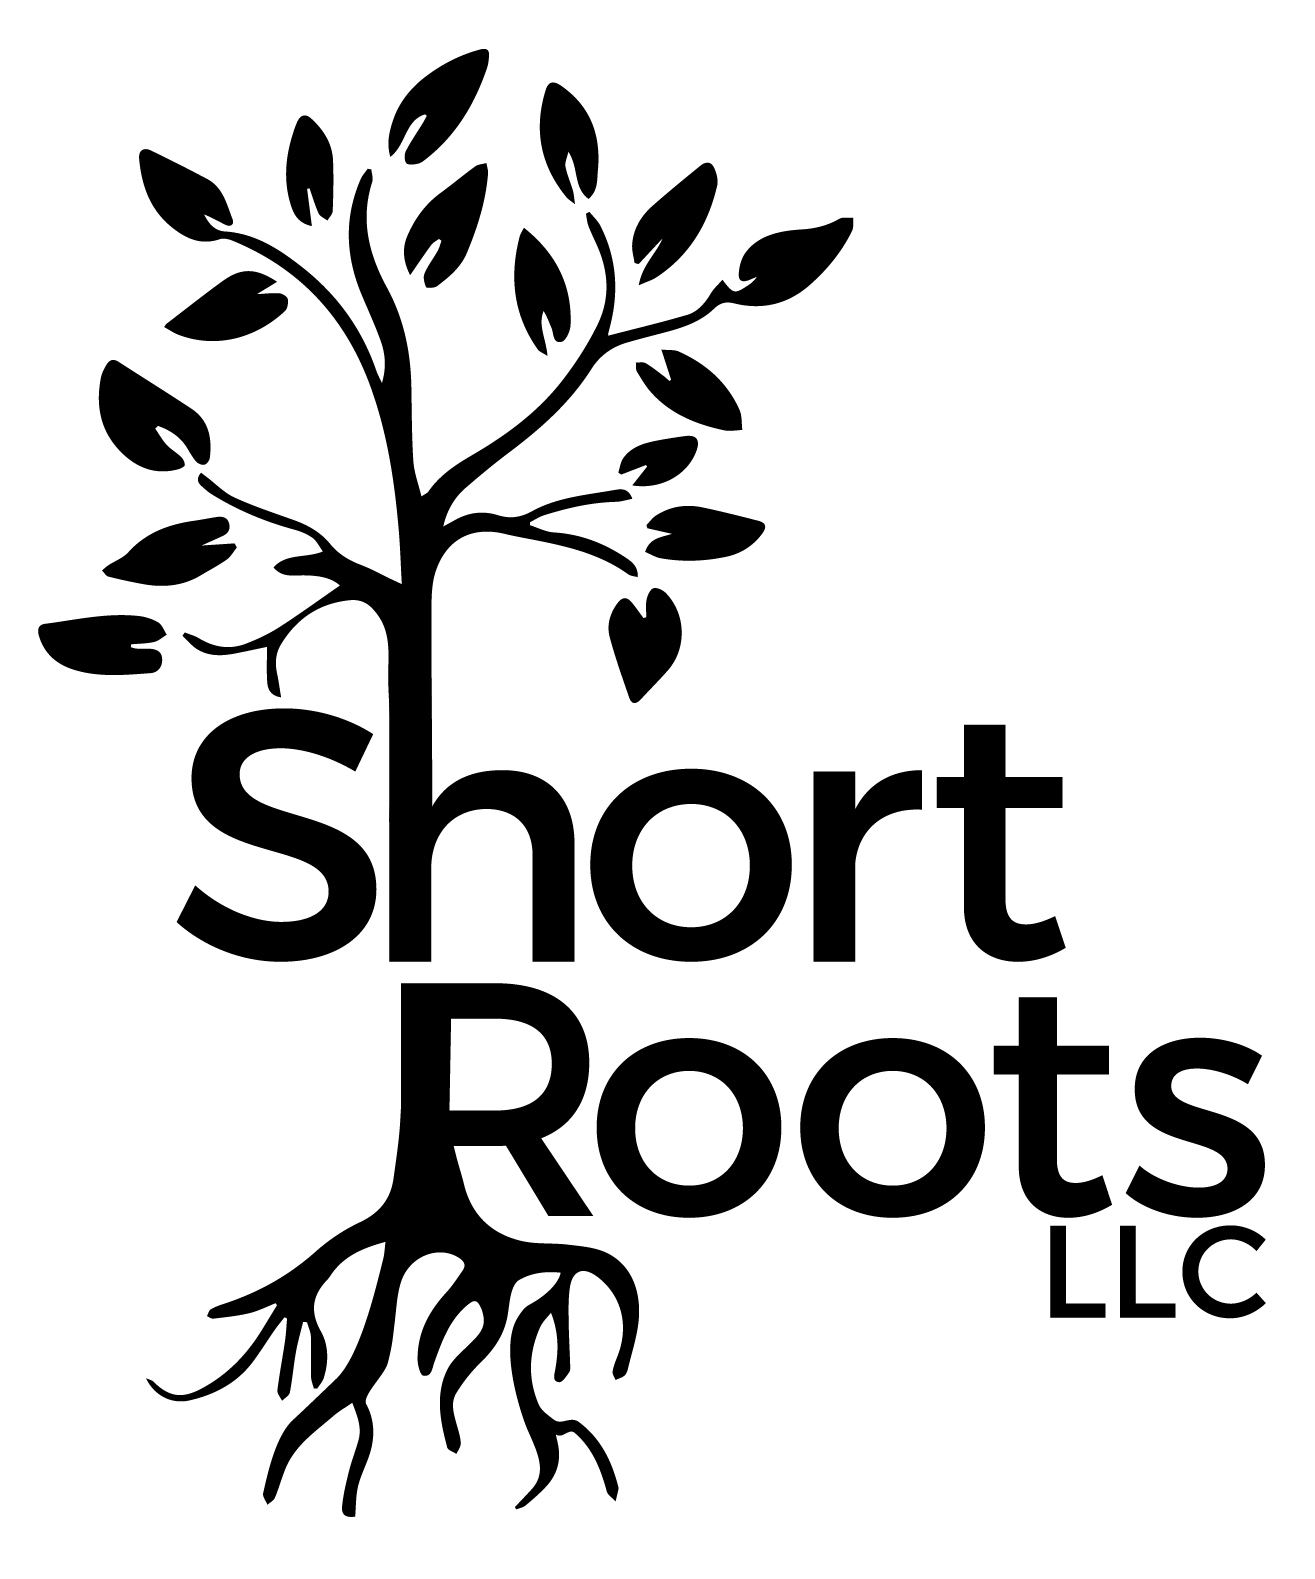 short roots logo design(JPEG).jpg